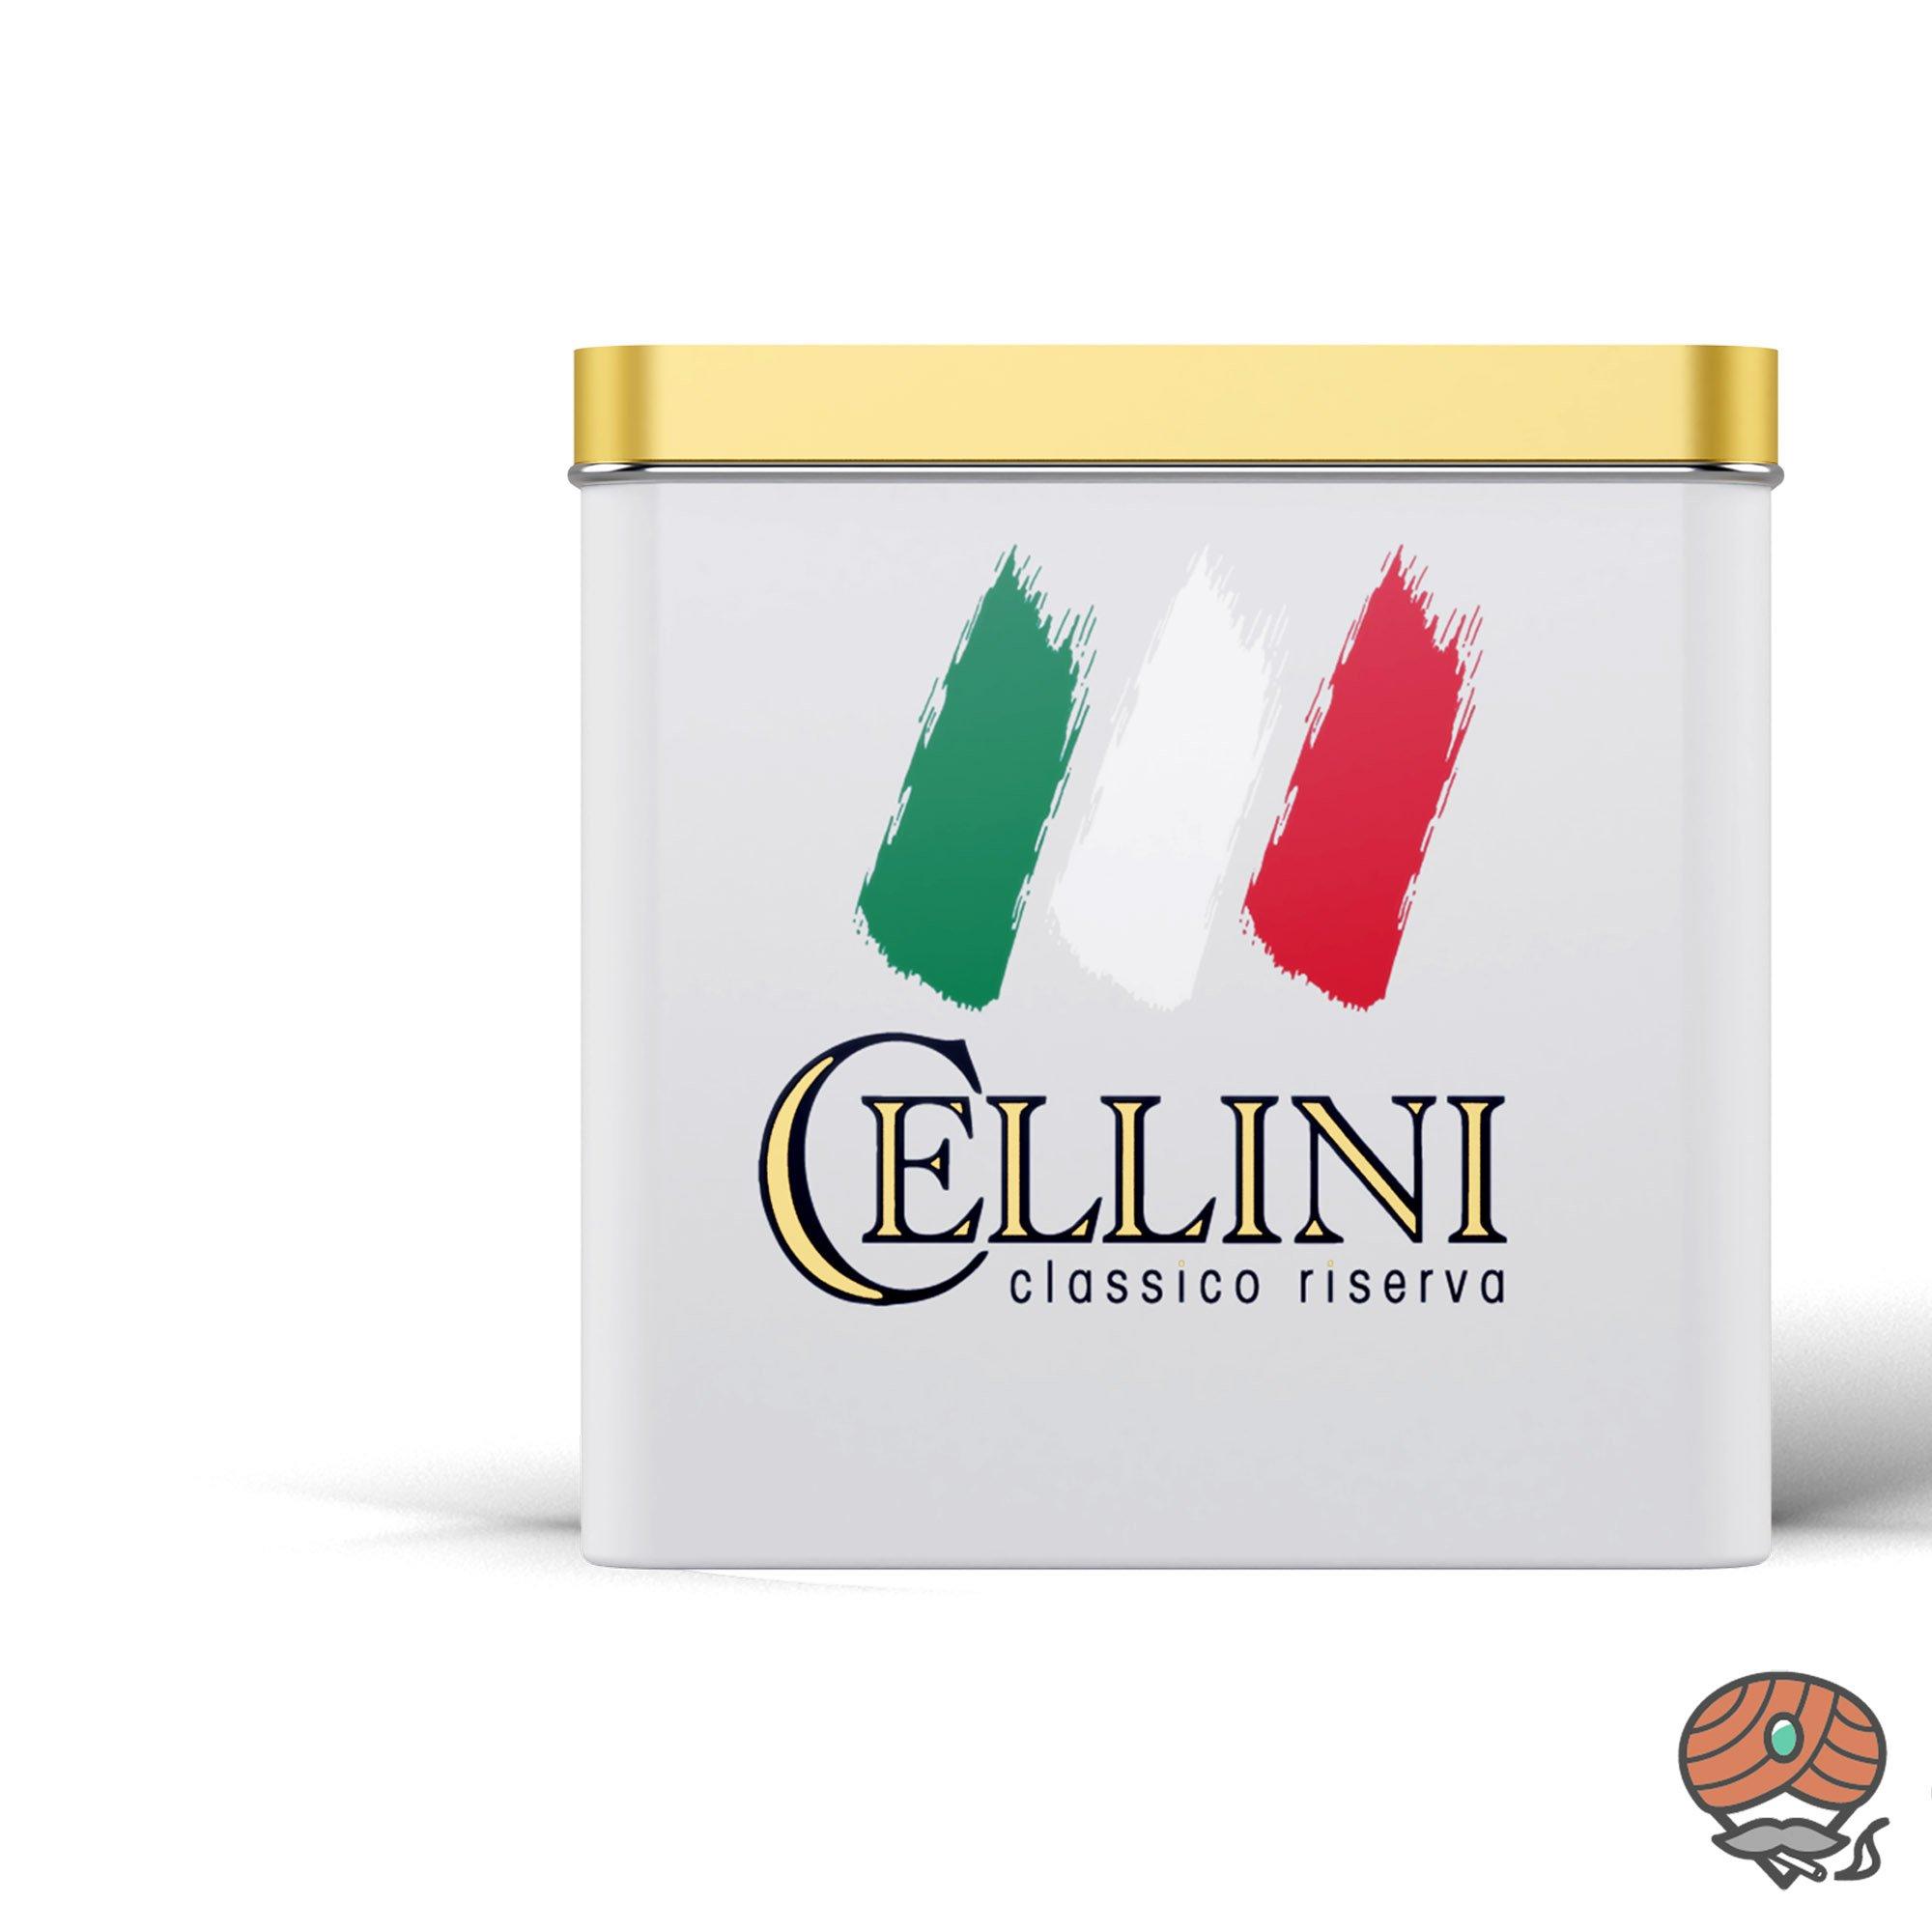 Cellini Classico Riserva Pfeifentabak 100g Dose